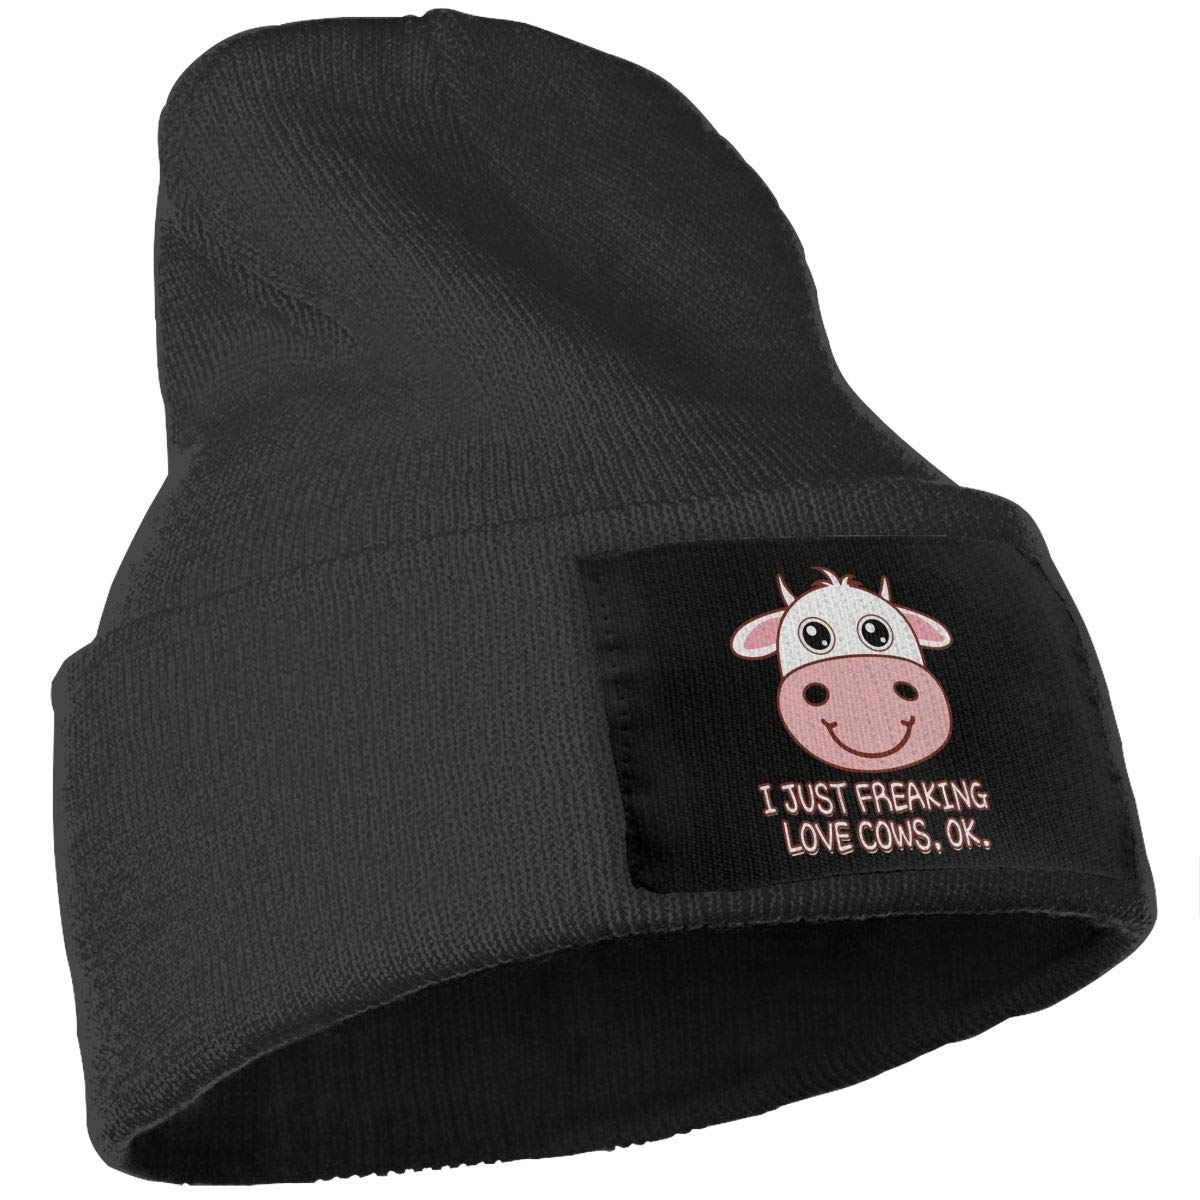 Men /& Women I Just Freaking Love Cows OK Outdoor Warm Knit Beanies Hat Soft Winter Knit Caps